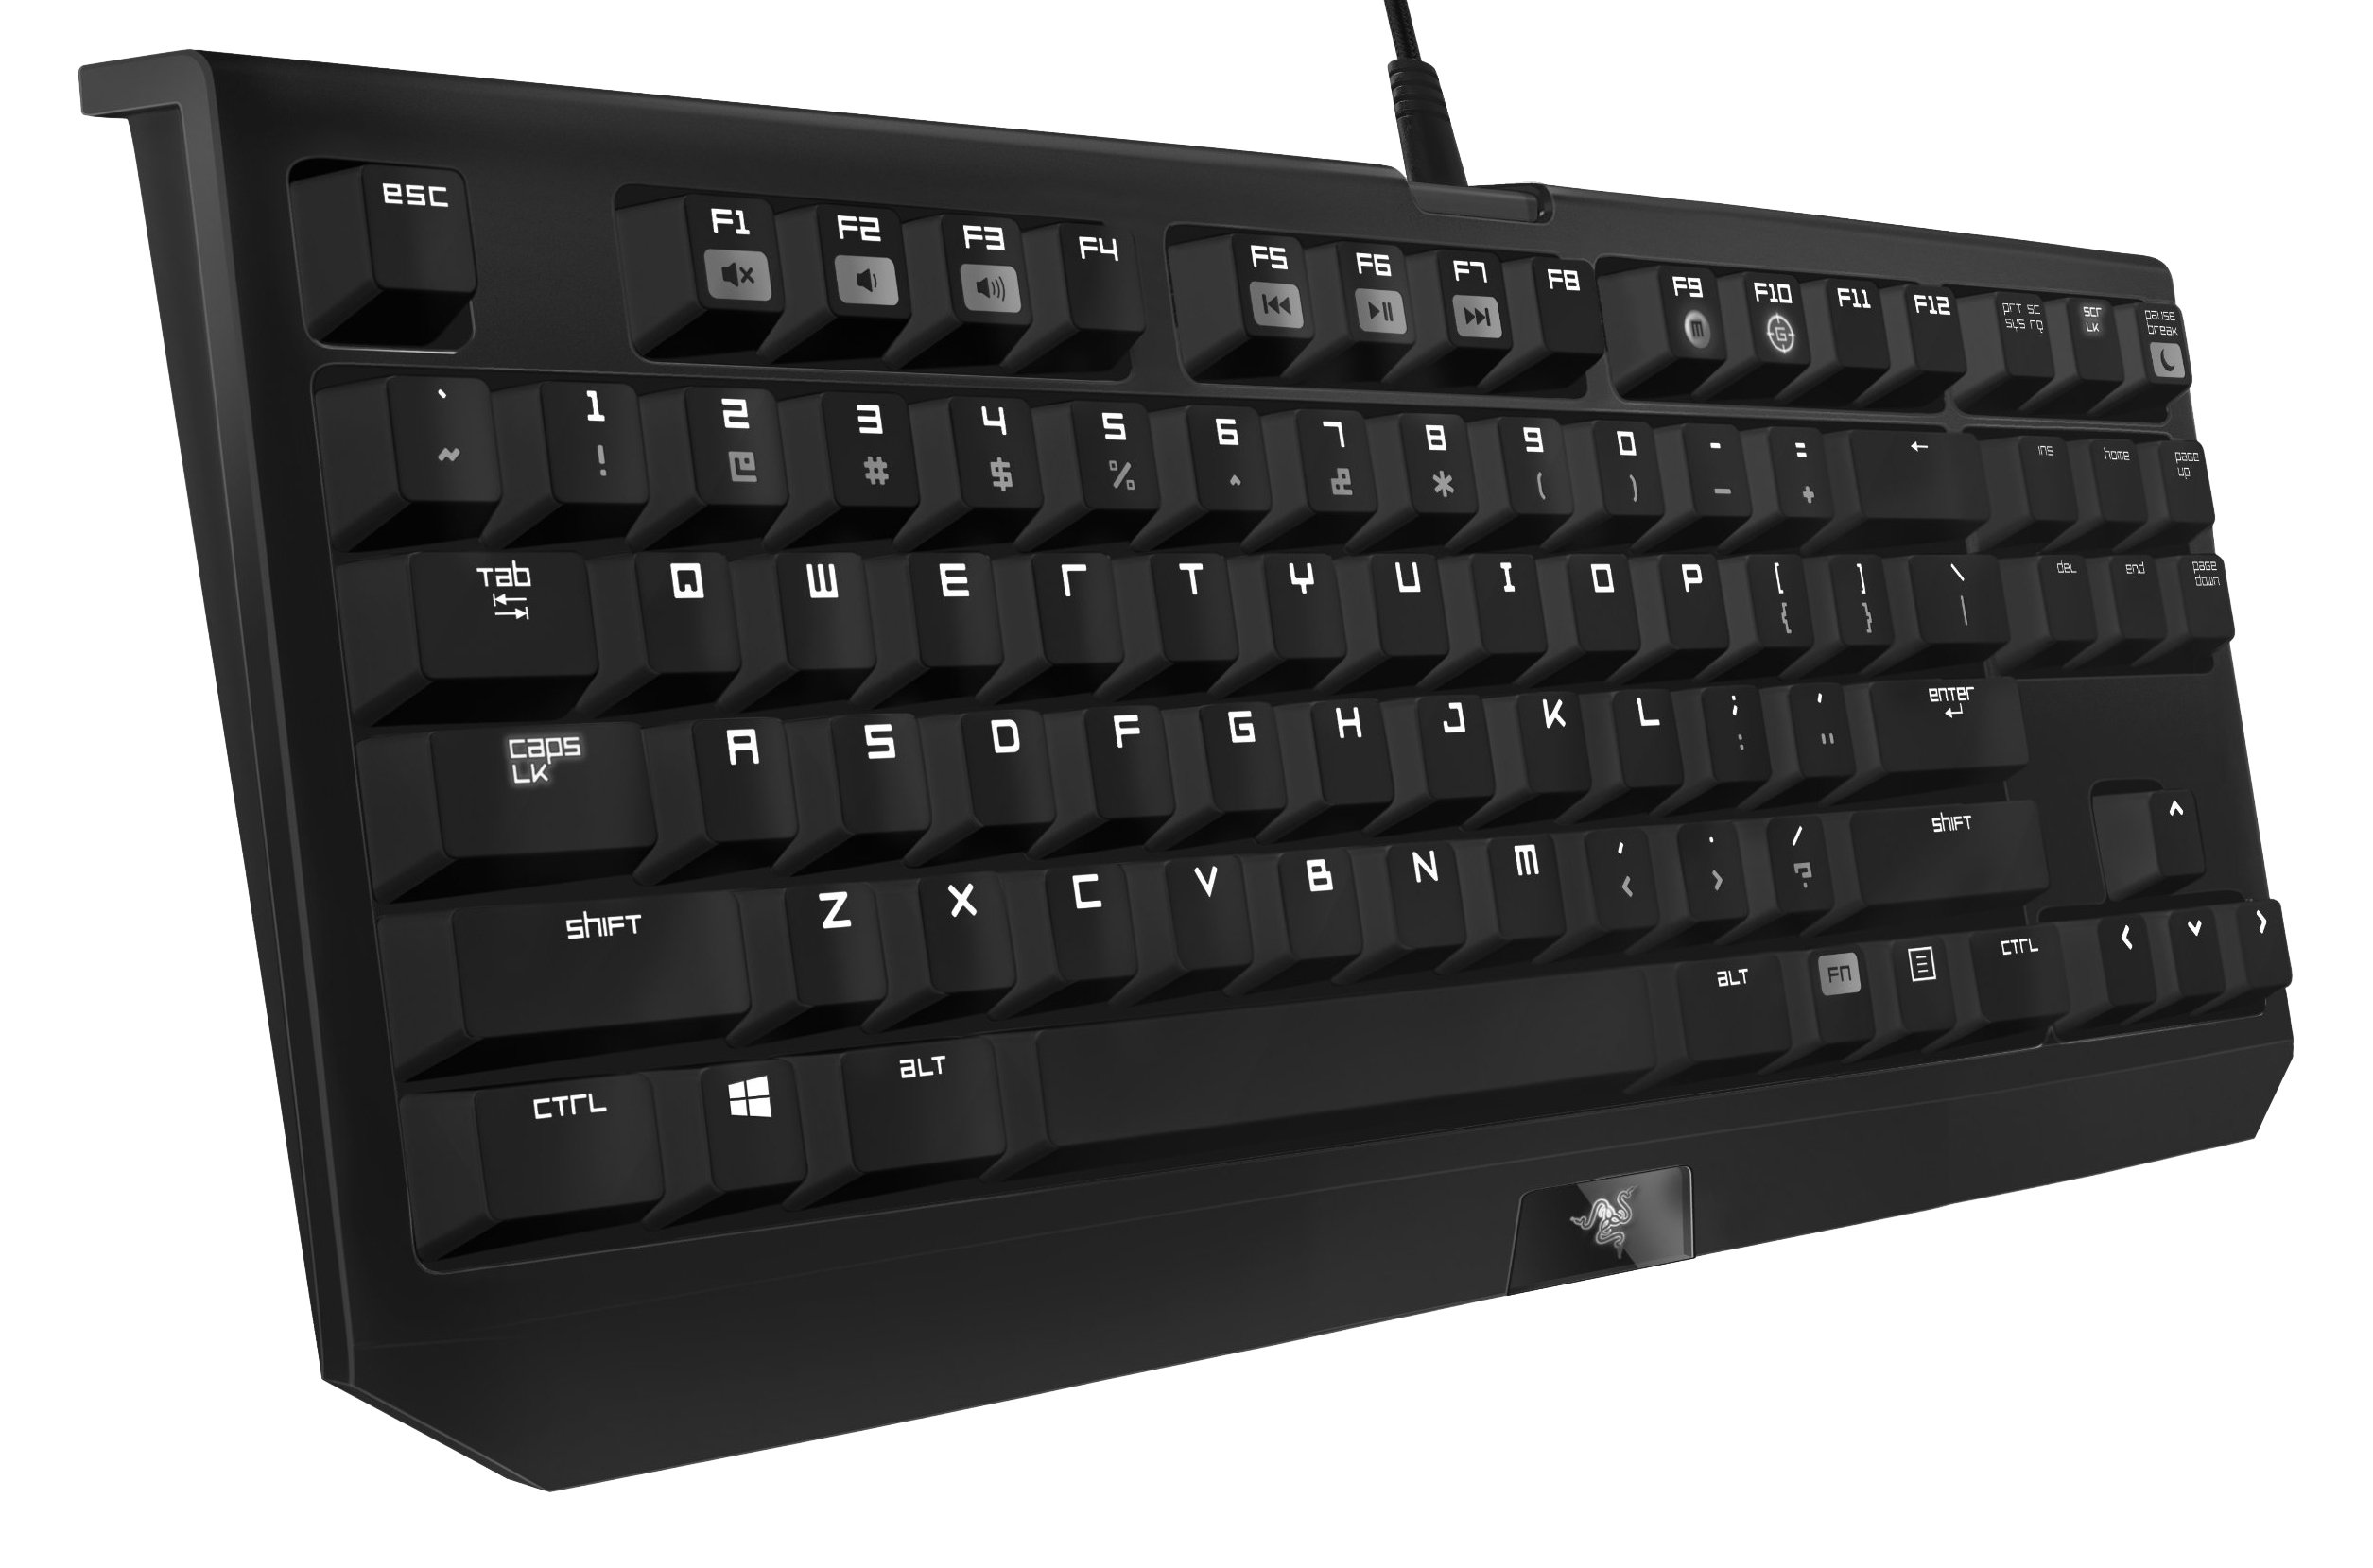 Razer BlackWidow Tournament Edition Stealth - Essential Mechanical Gaming Keyboard - Compact Layout - Tactile & Silent Razer Orange Switches by Razer